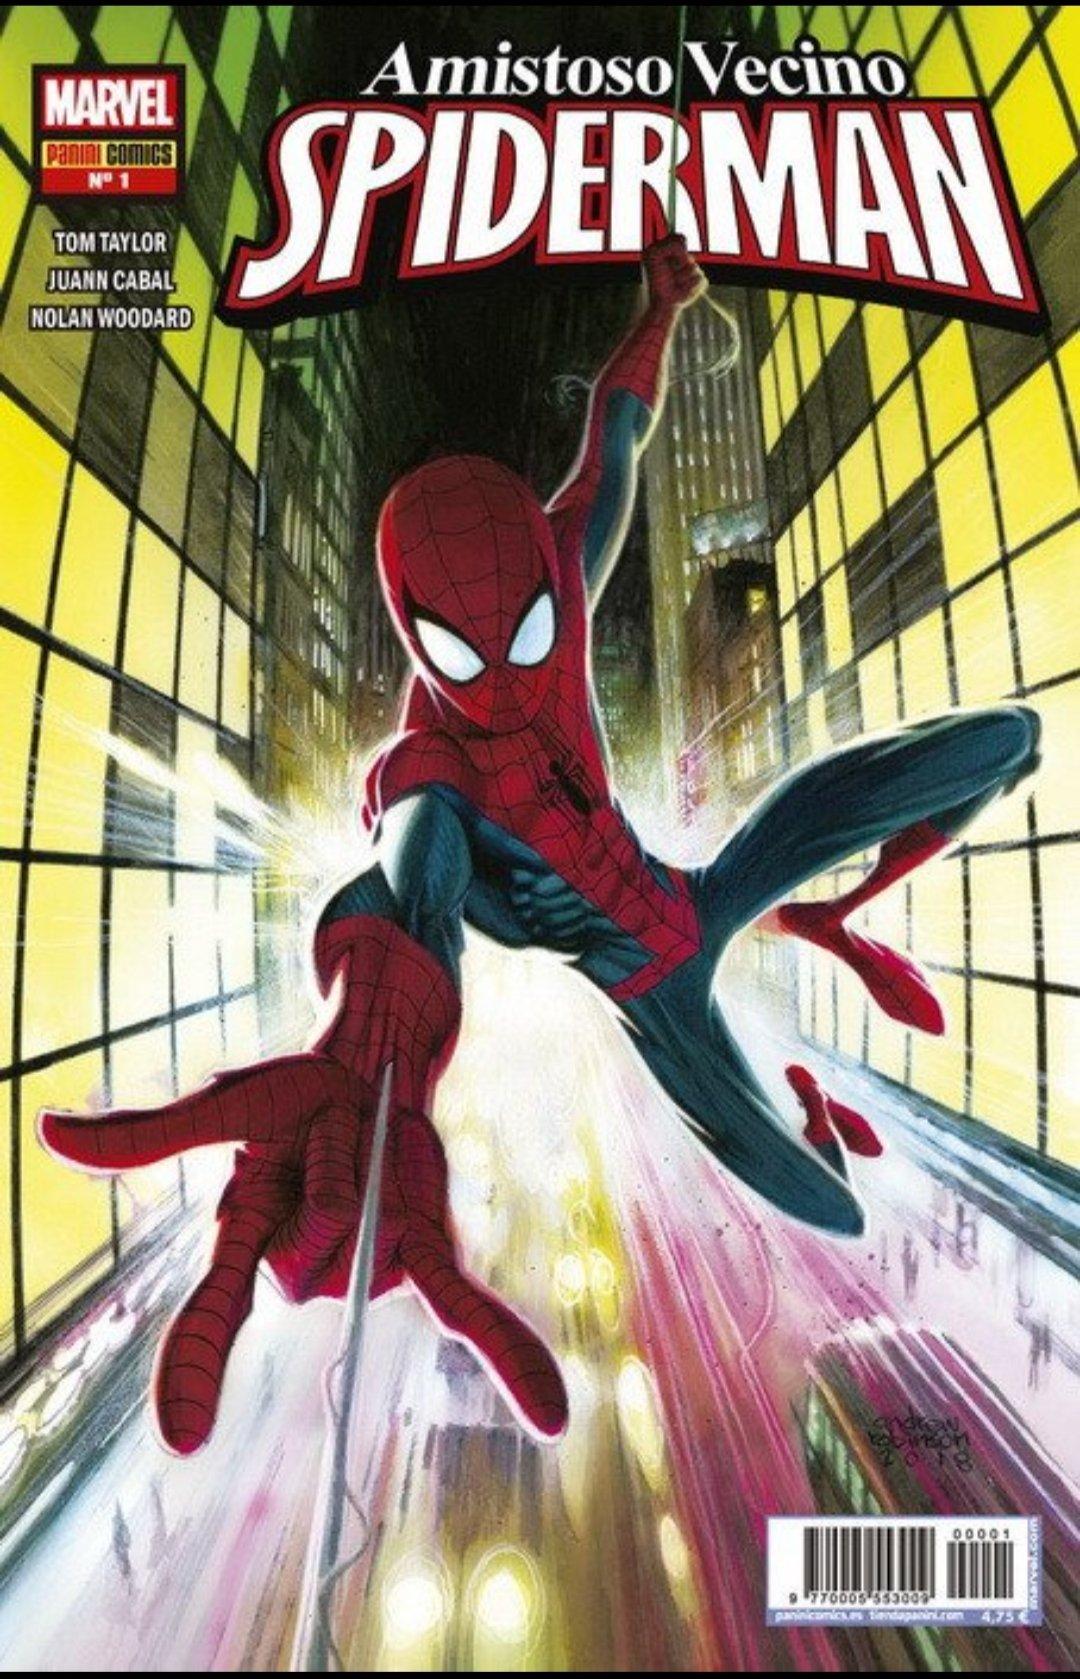 Amistoso Vecino Spiderman